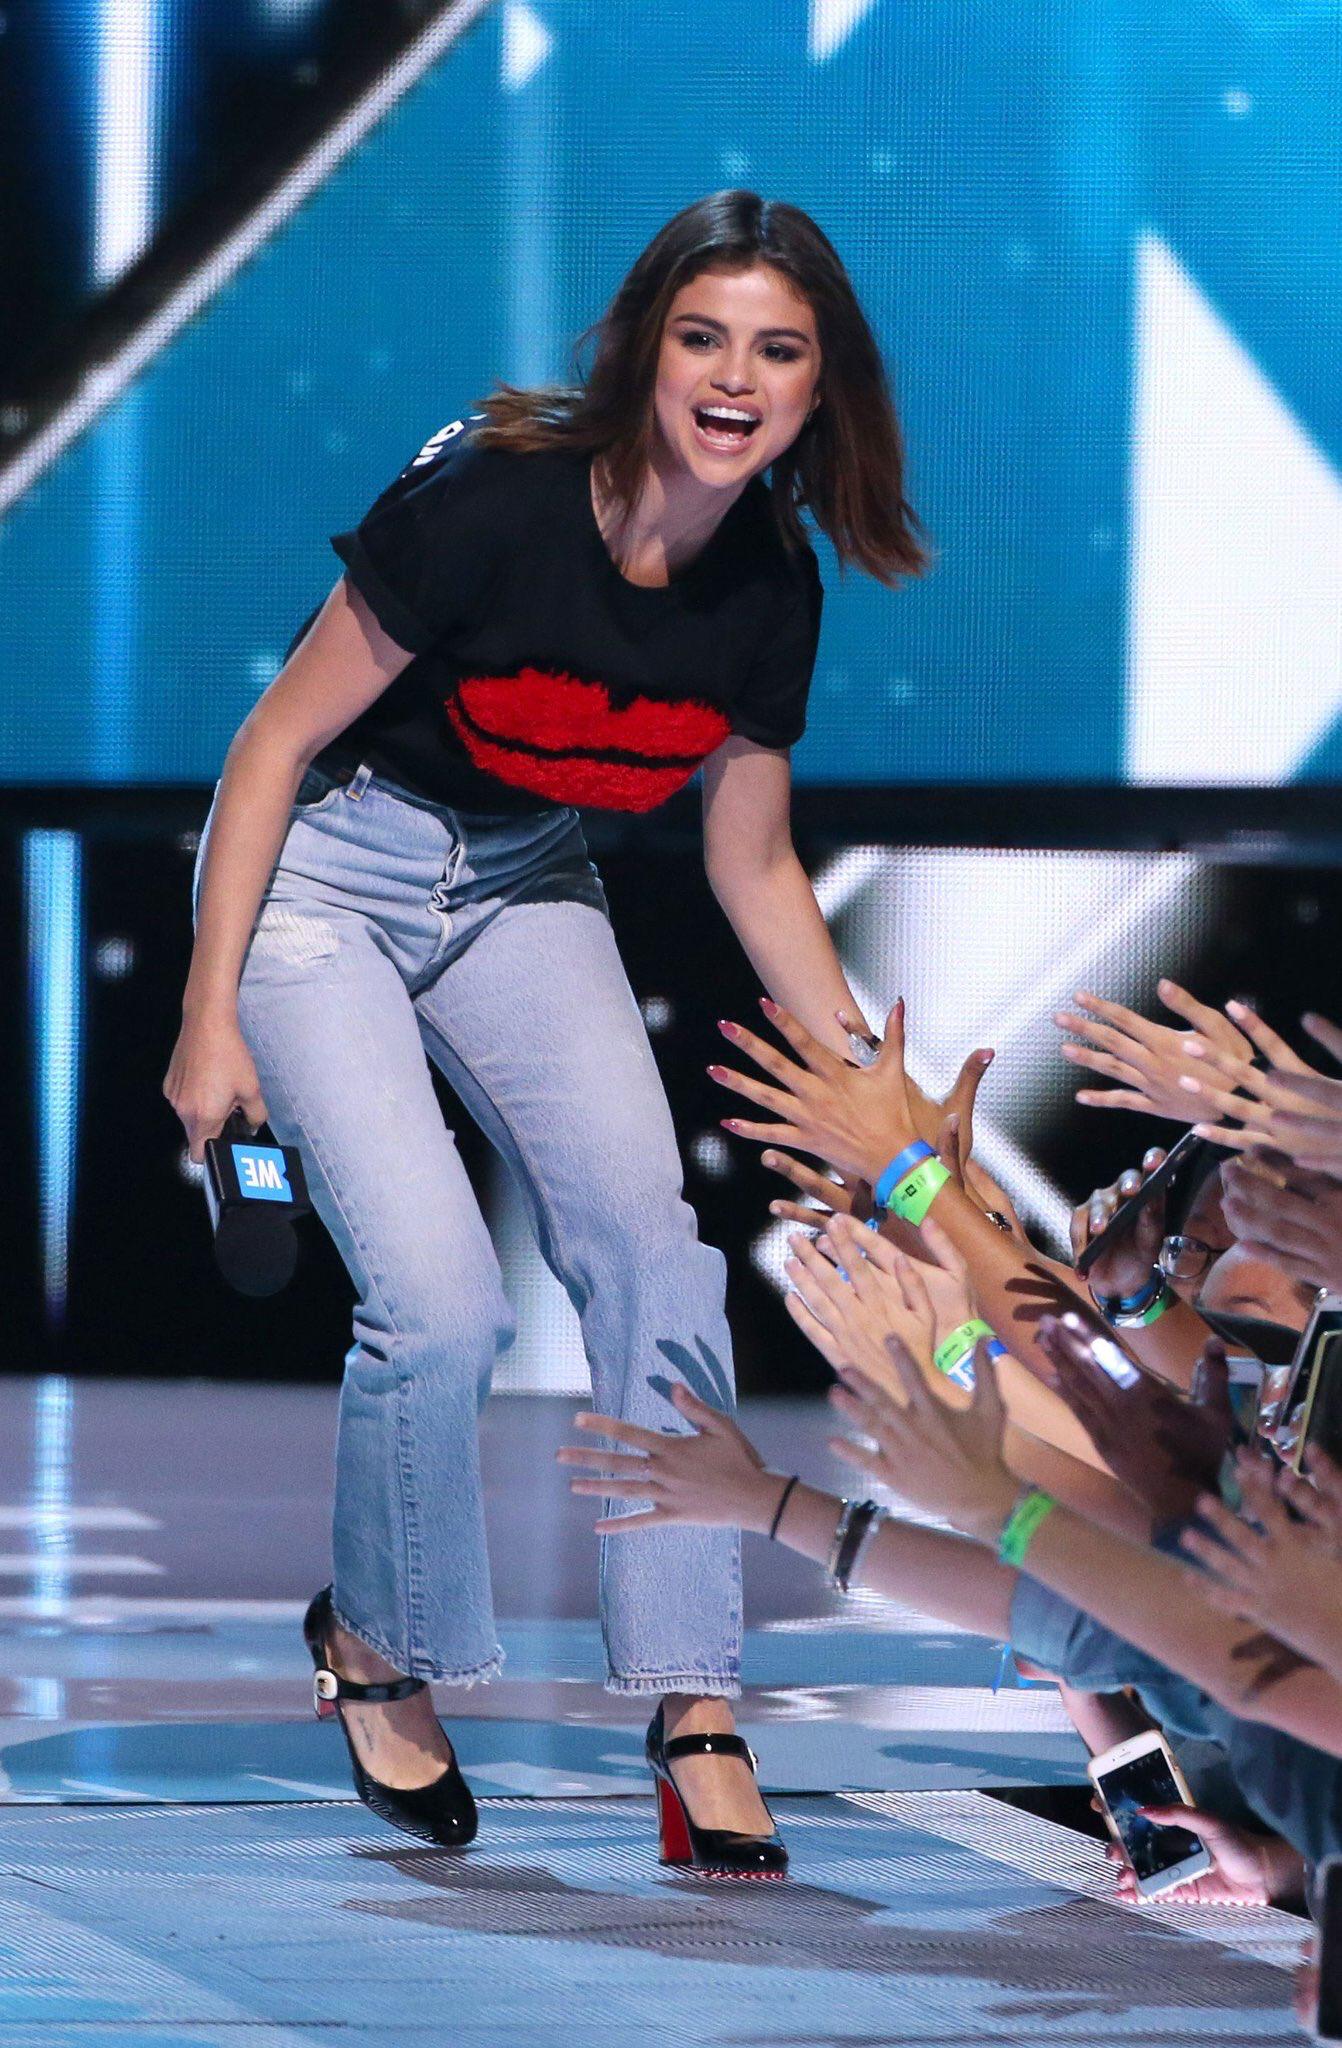 a6f8dcb6b1fa Selena Gomez x We Day